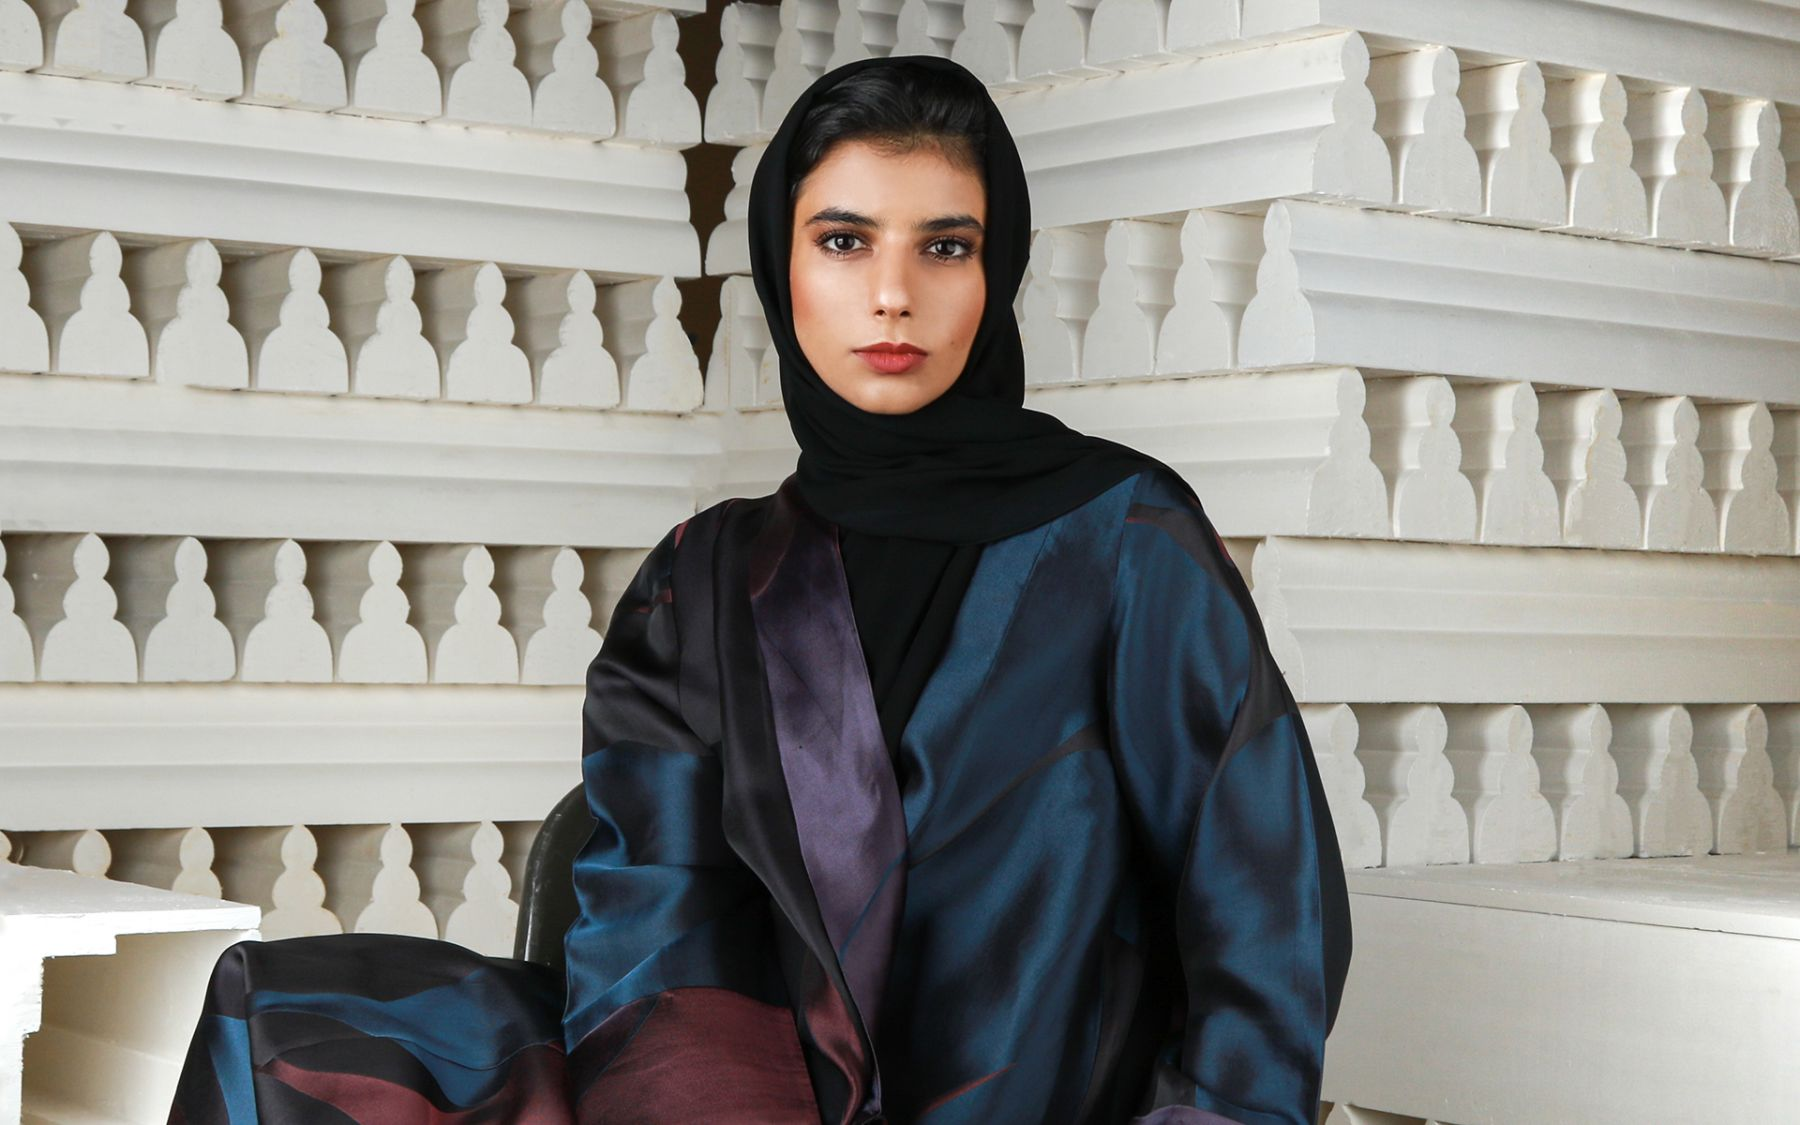 Fatma Al Mahmoud announced as 2021 guest curator